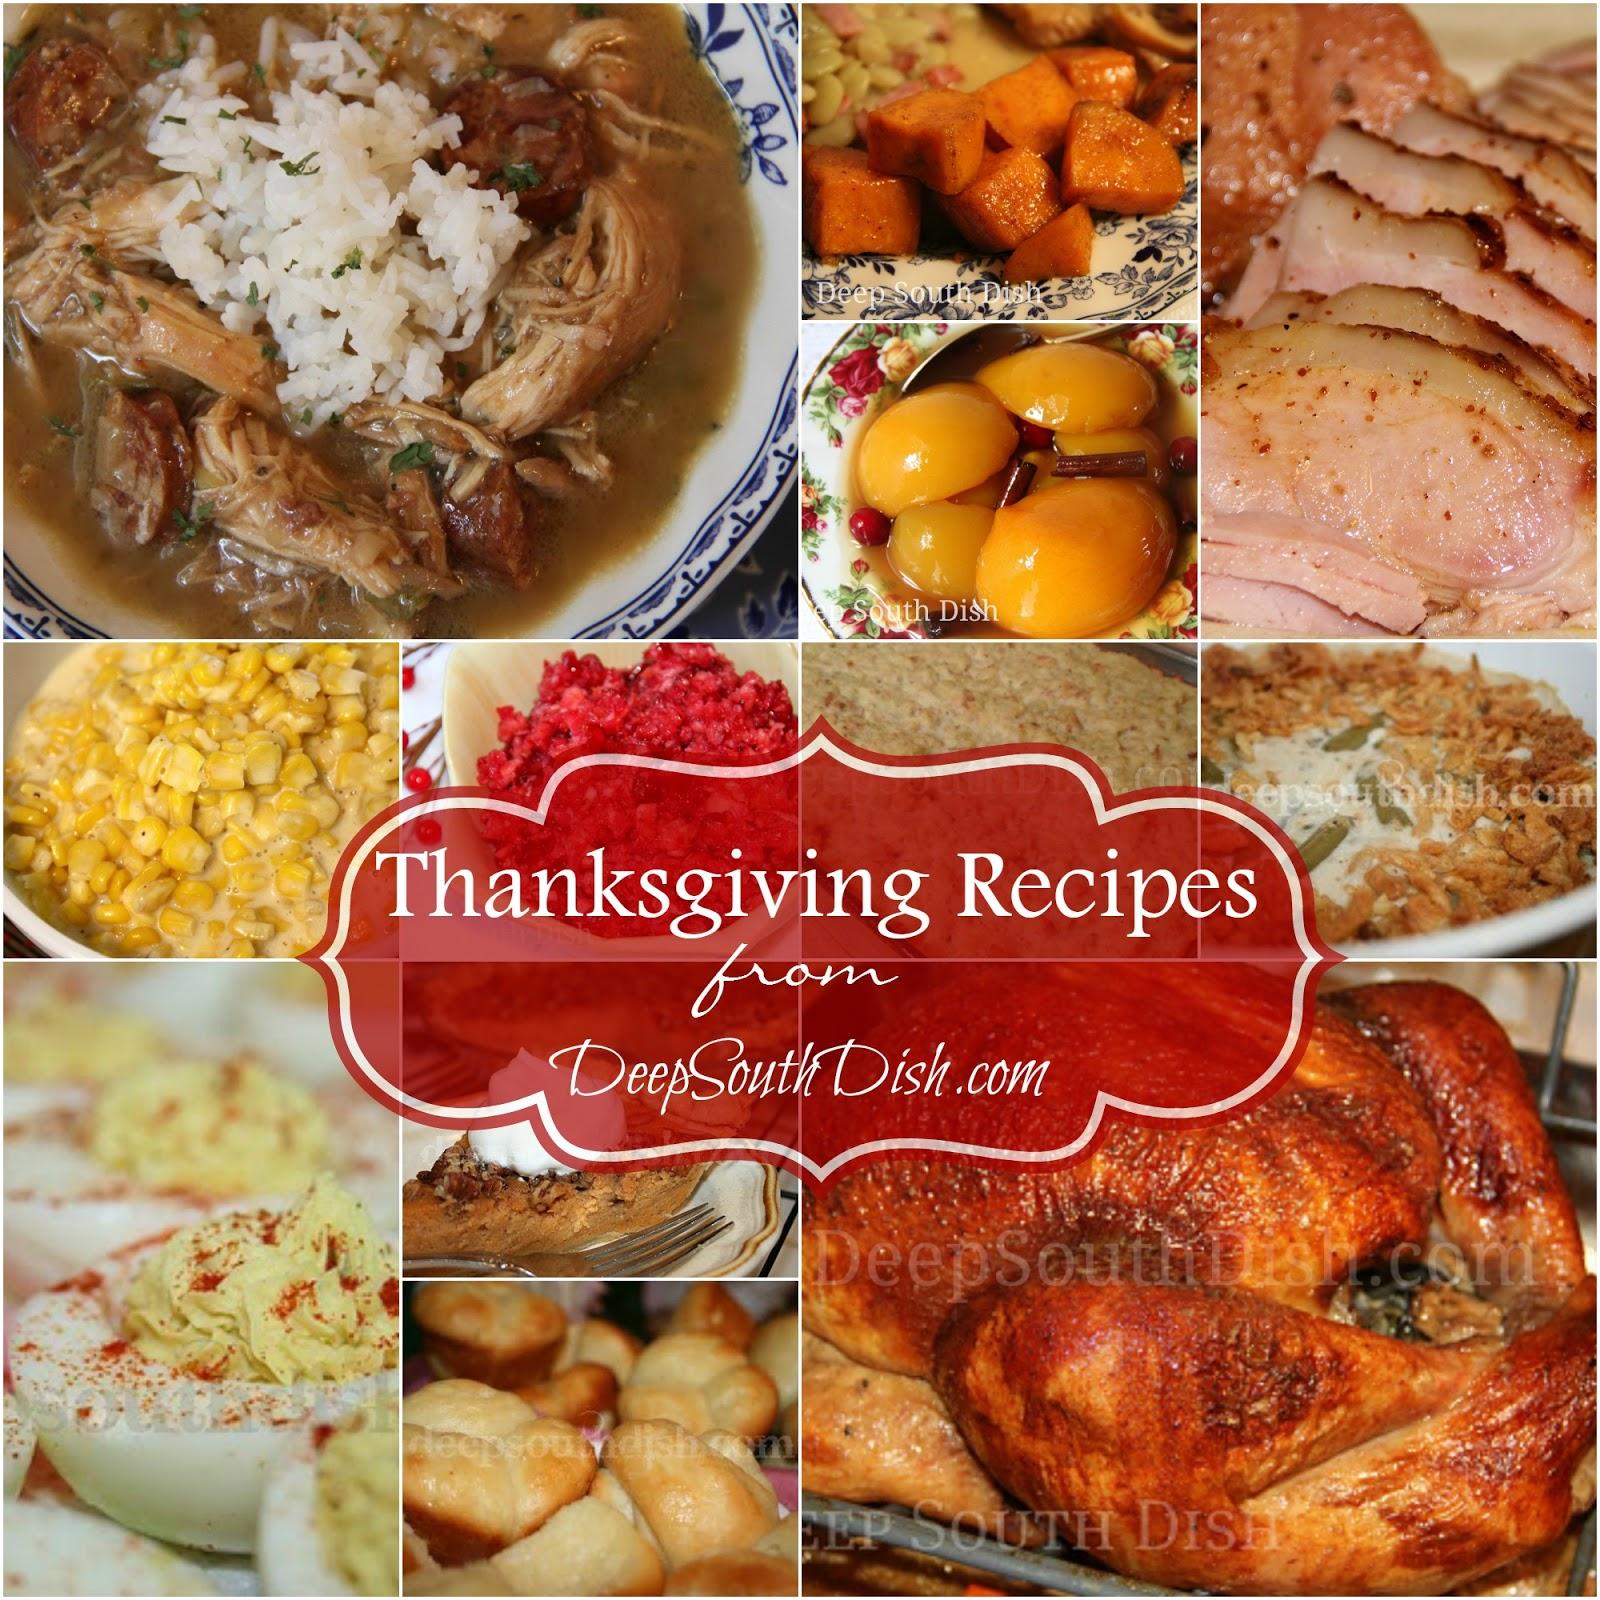 Deep south dish deep south southern thanksgiving recipes for Traditional southern thanksgiving dinner menu